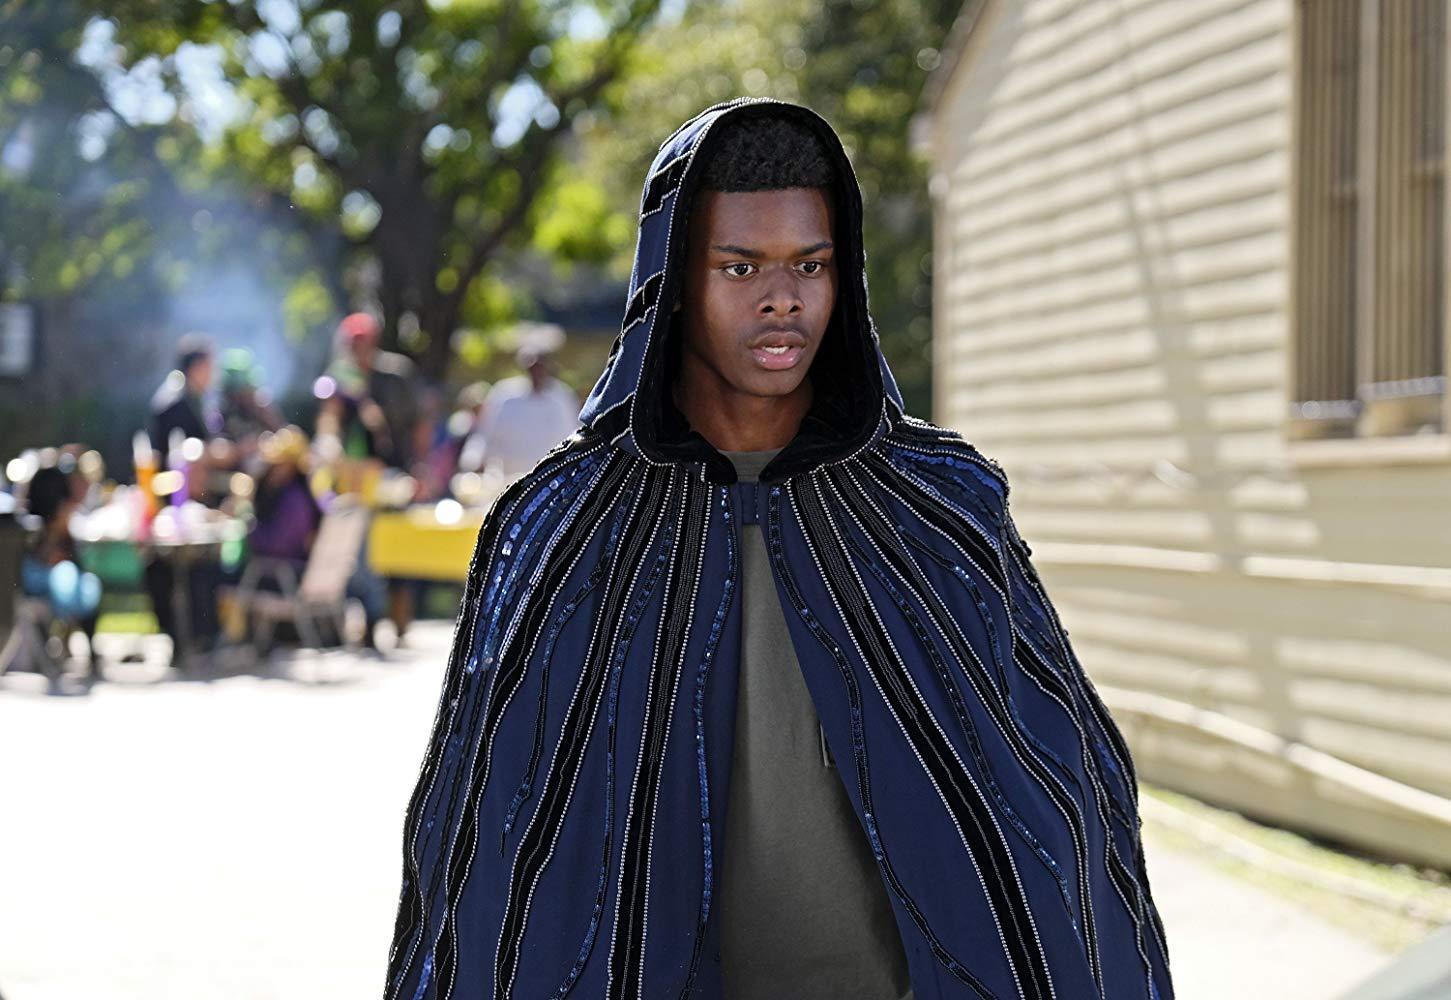 Cloak & Dagger - Season 2